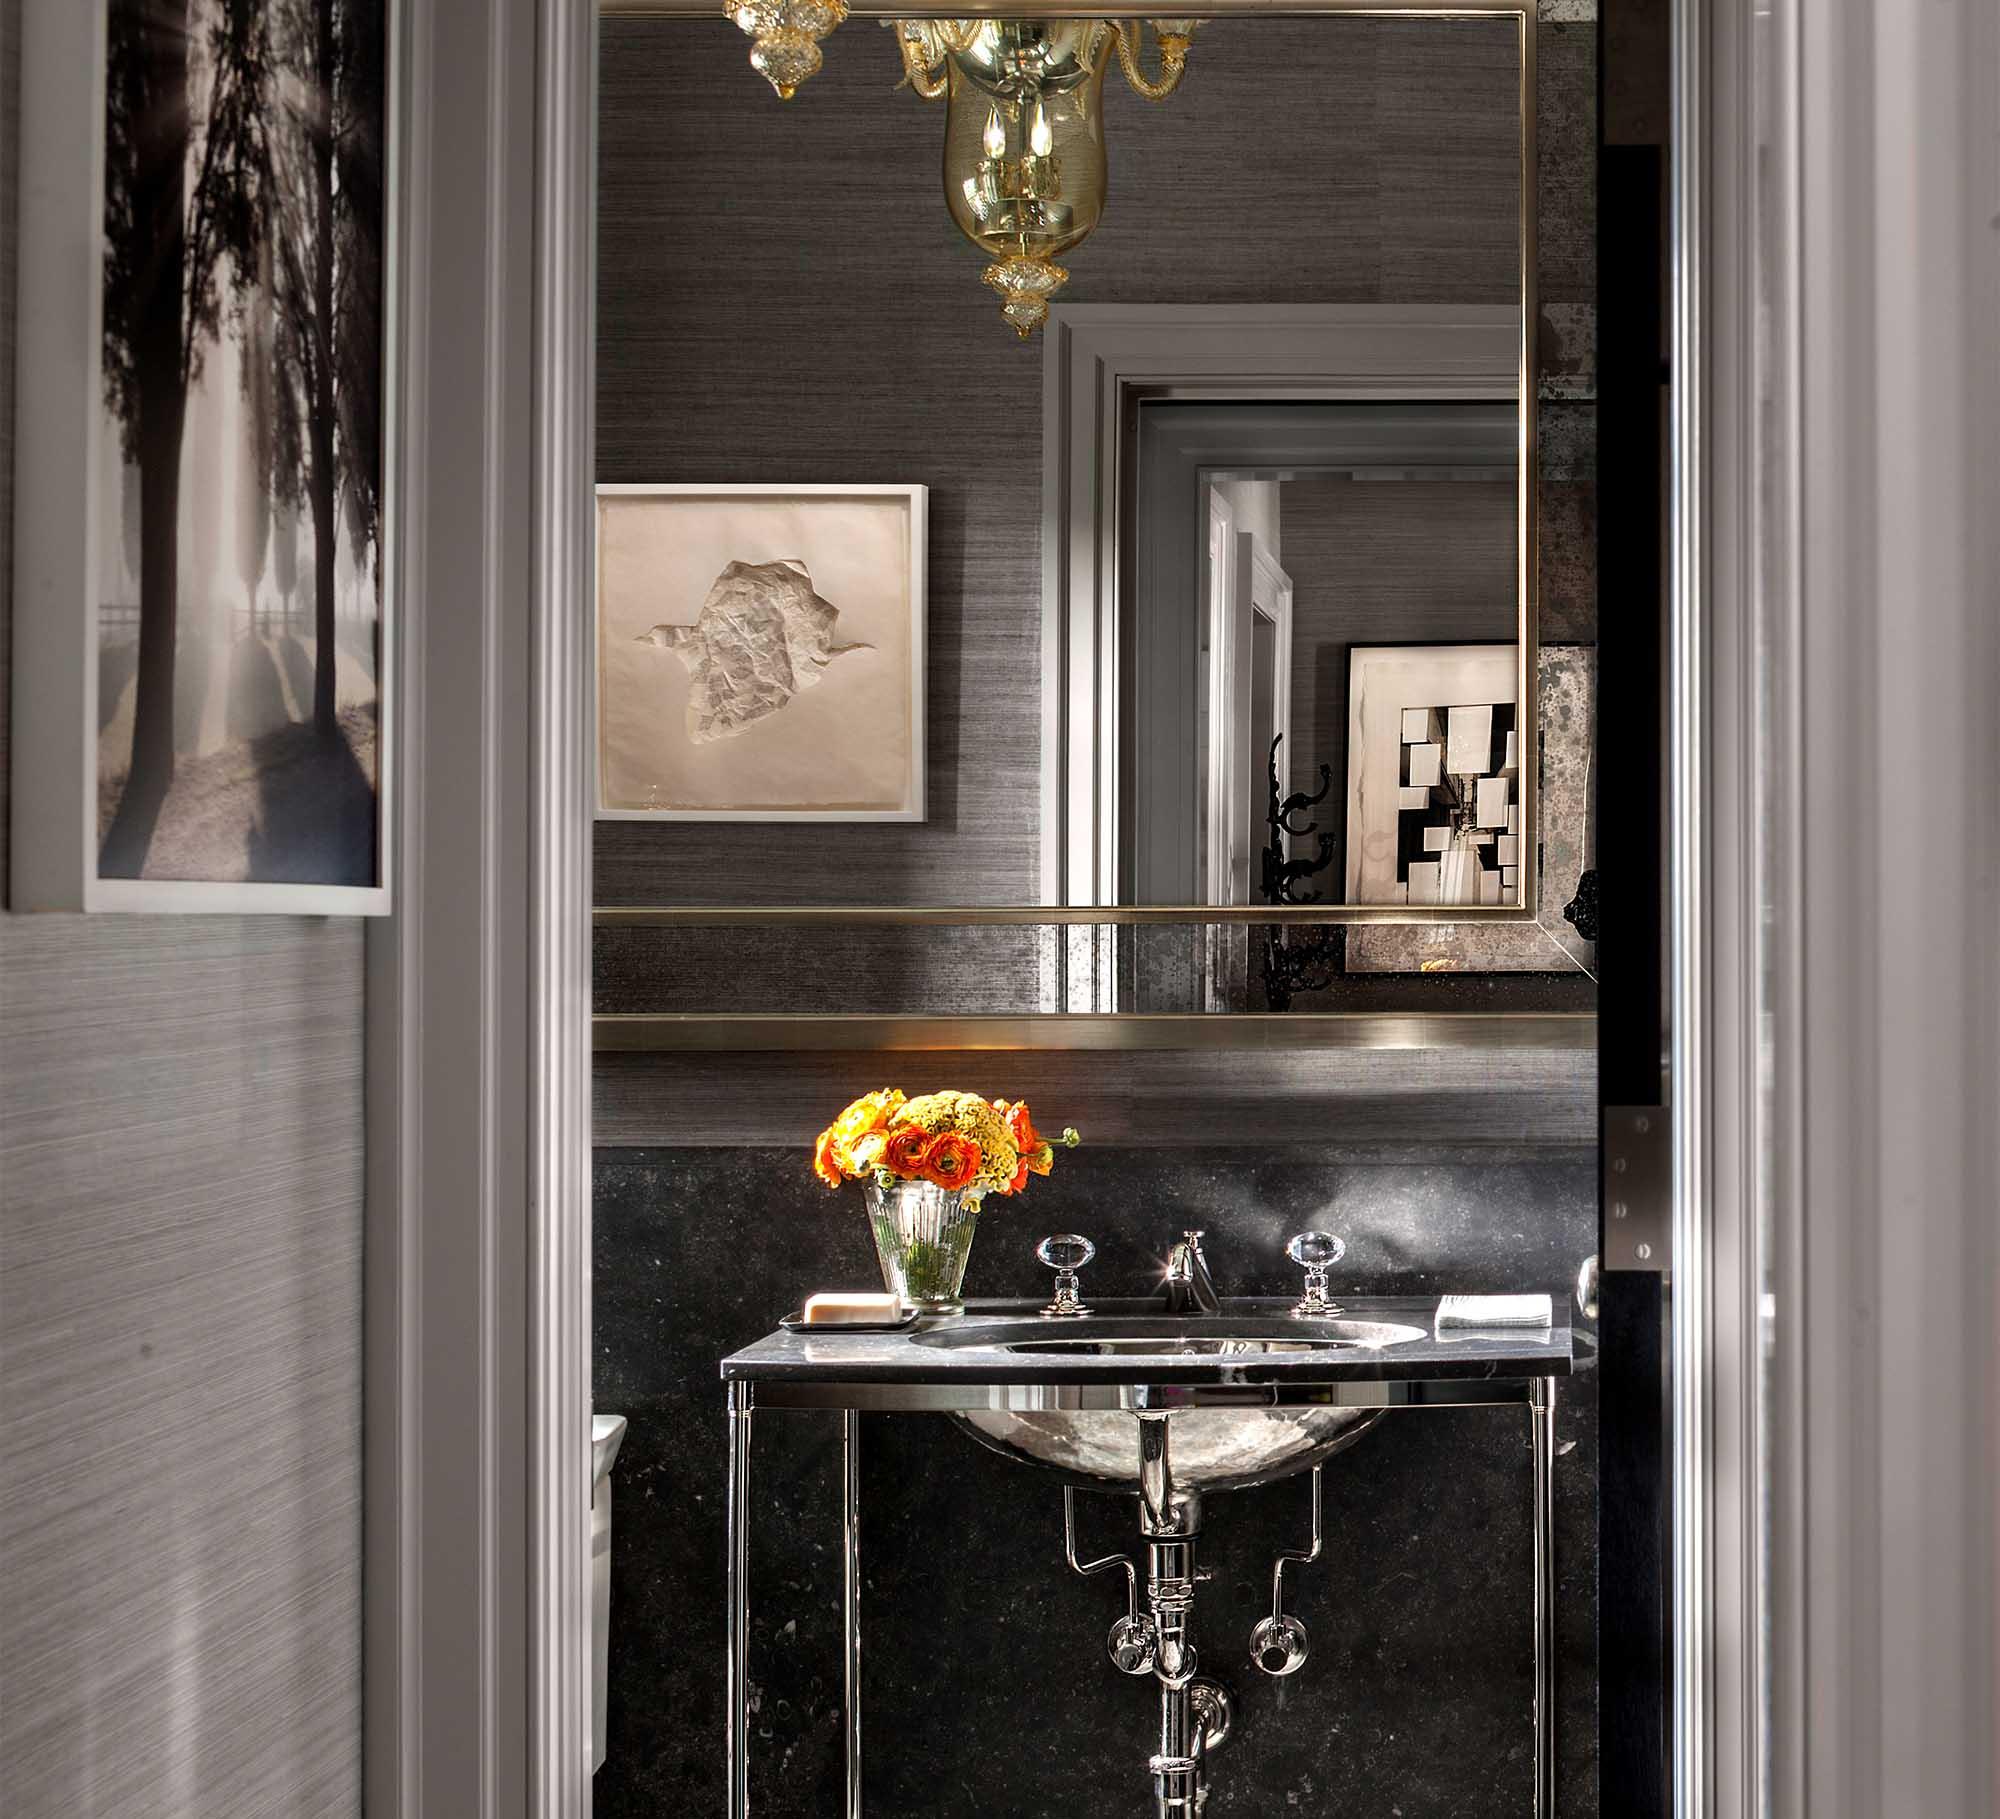 79th Street Apartment, Lenox Hill, Manhattan, Central Park transitional, power room